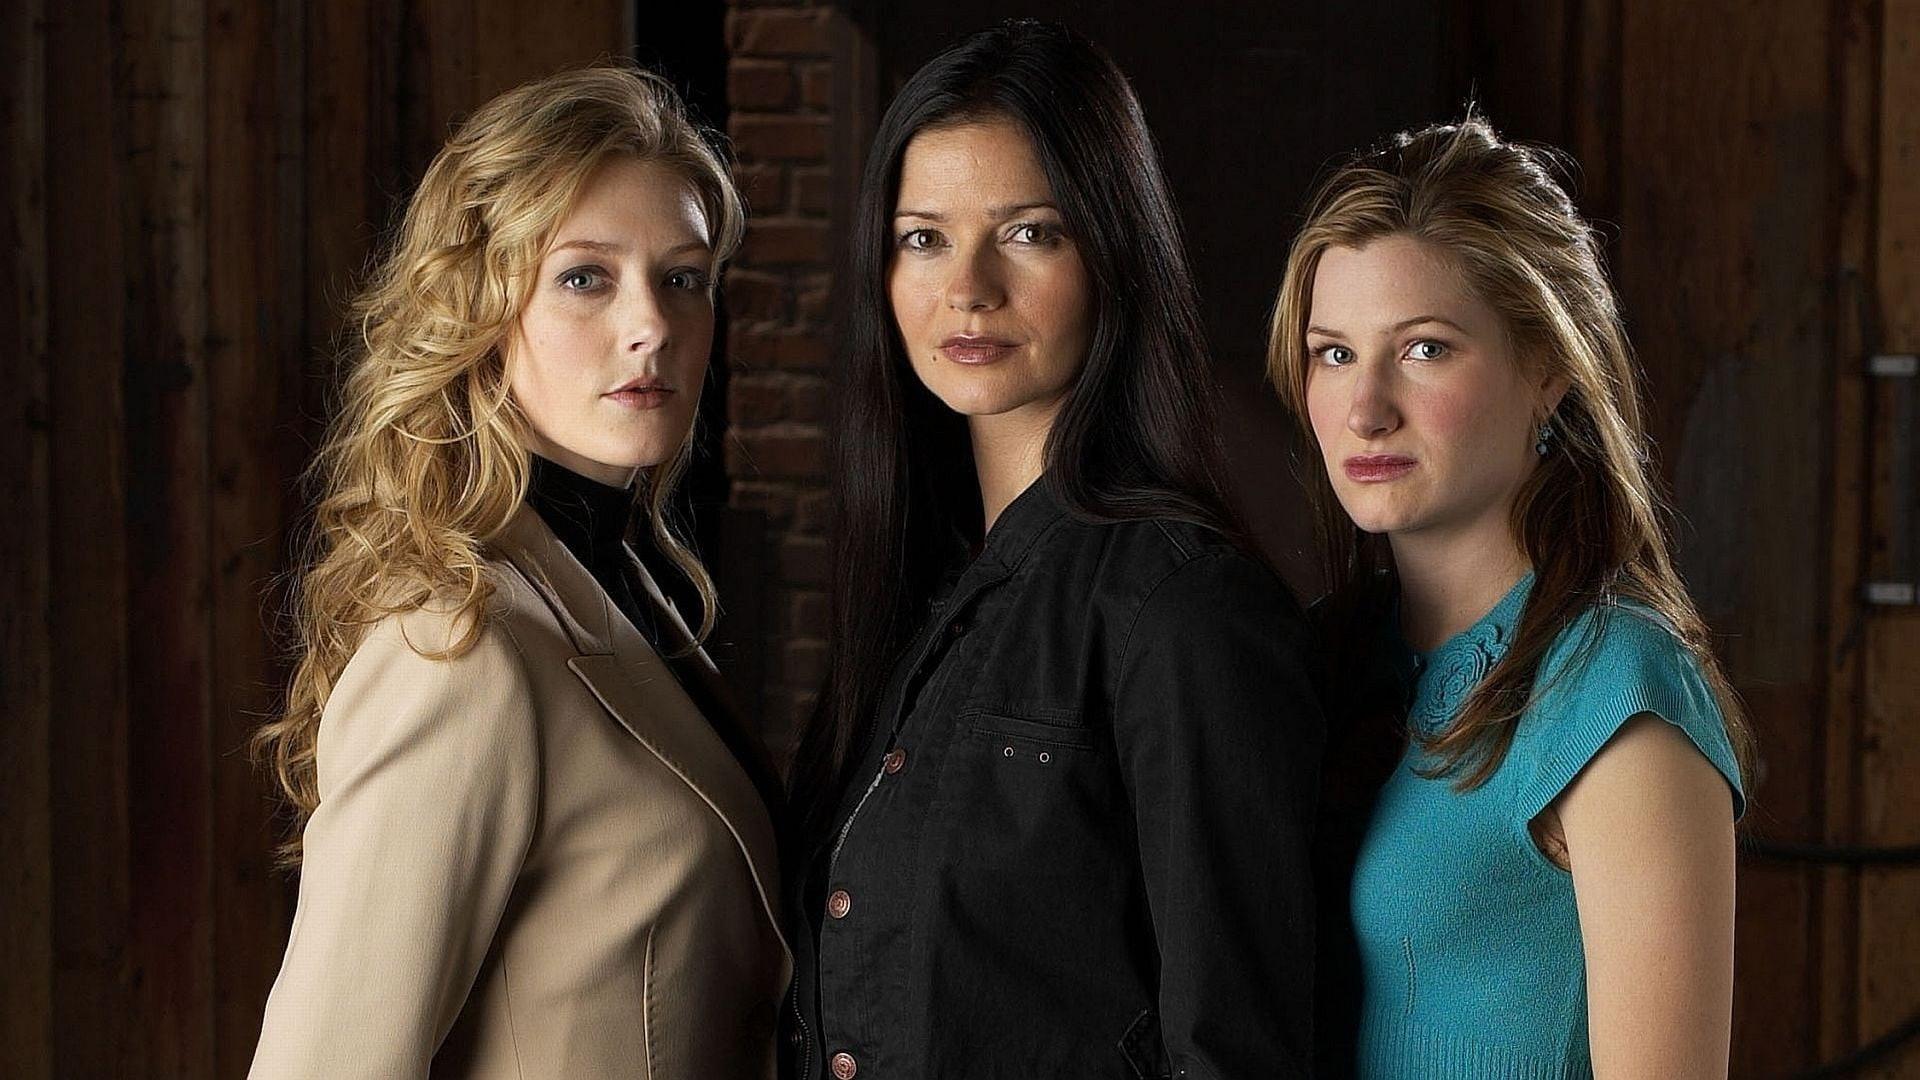 Kathryn Hahn (right) as Lily in 'Crossing Jordan'.